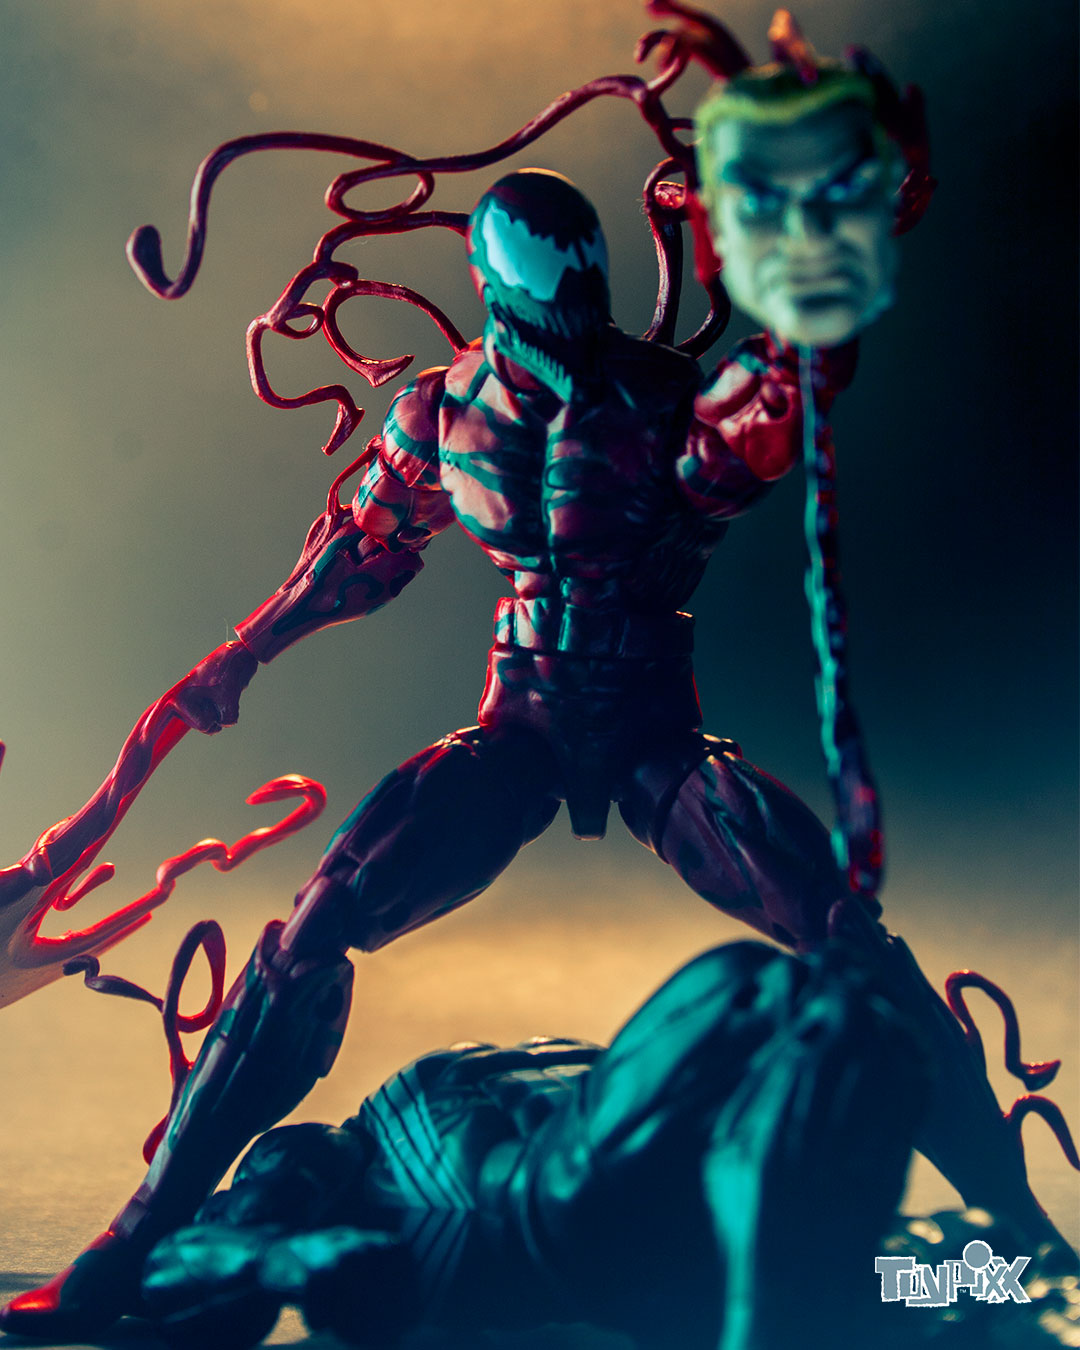 Toypixx Marvel Legends Carnage and Marvel Legends Venom Toy Photography